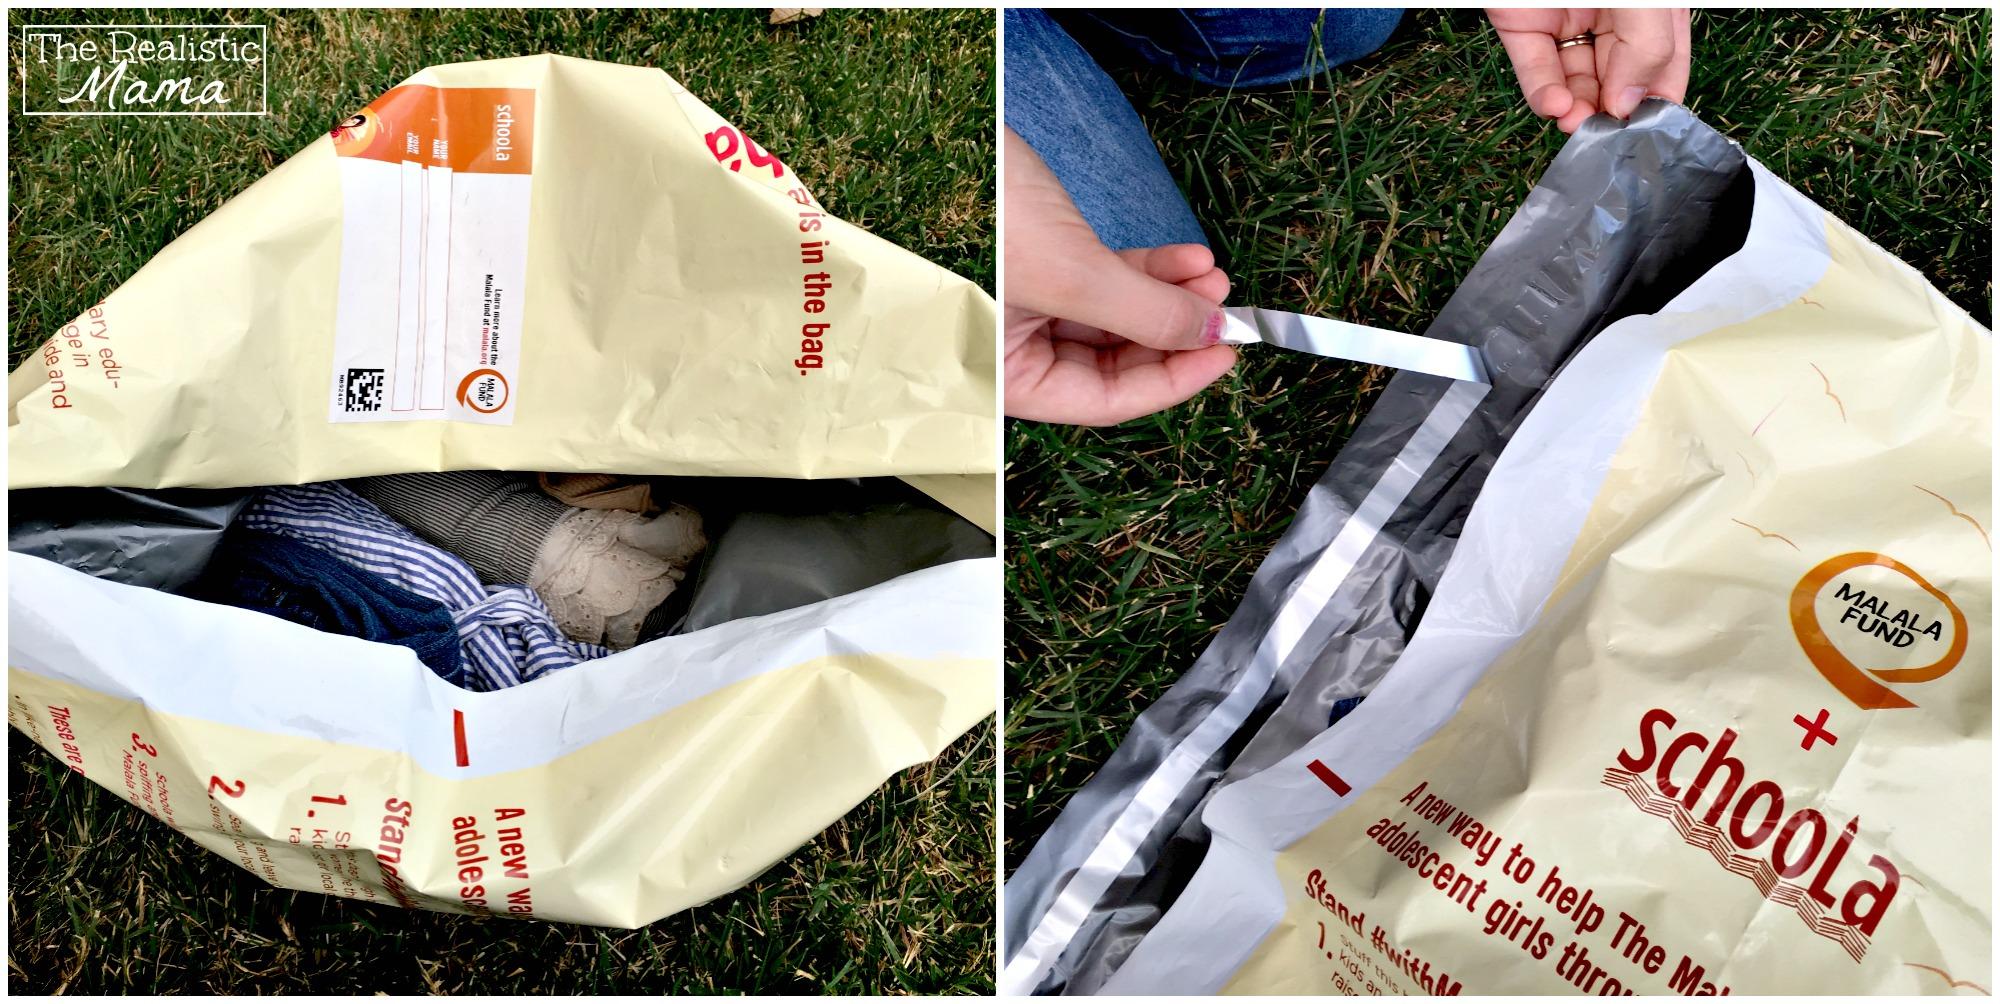 Filling a Malala donation bag